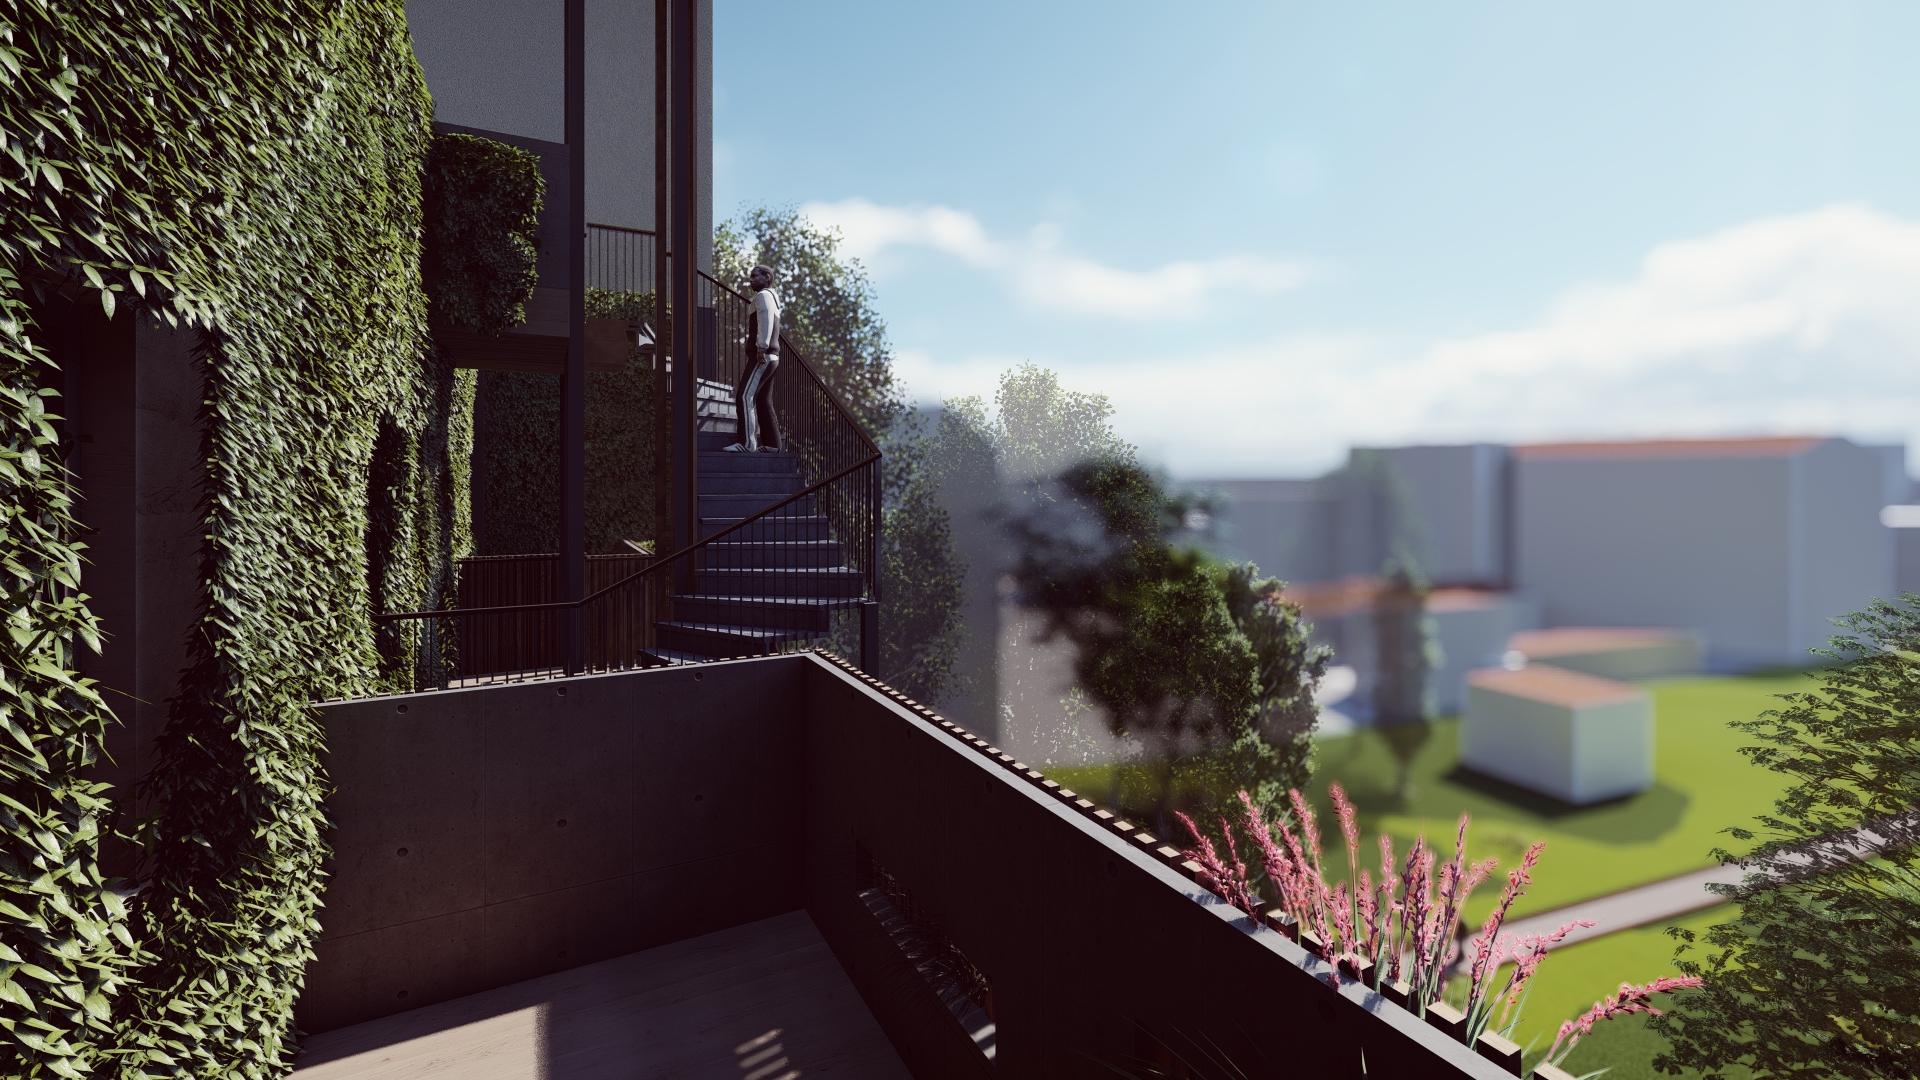 KMP4-2020-09-04_Hofseite-Balkon-Variante-1